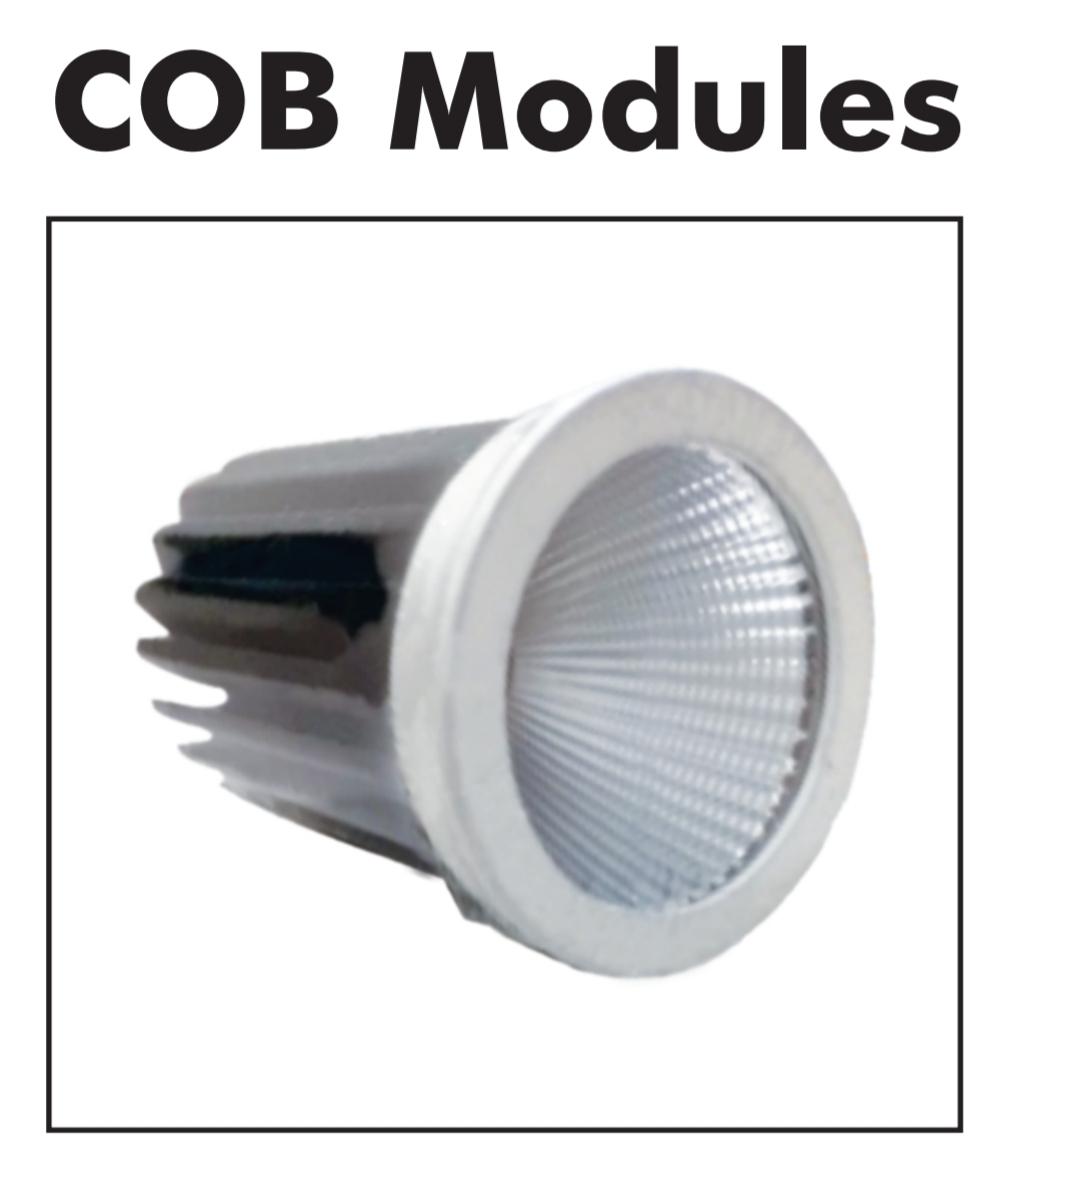 Led lights for celling